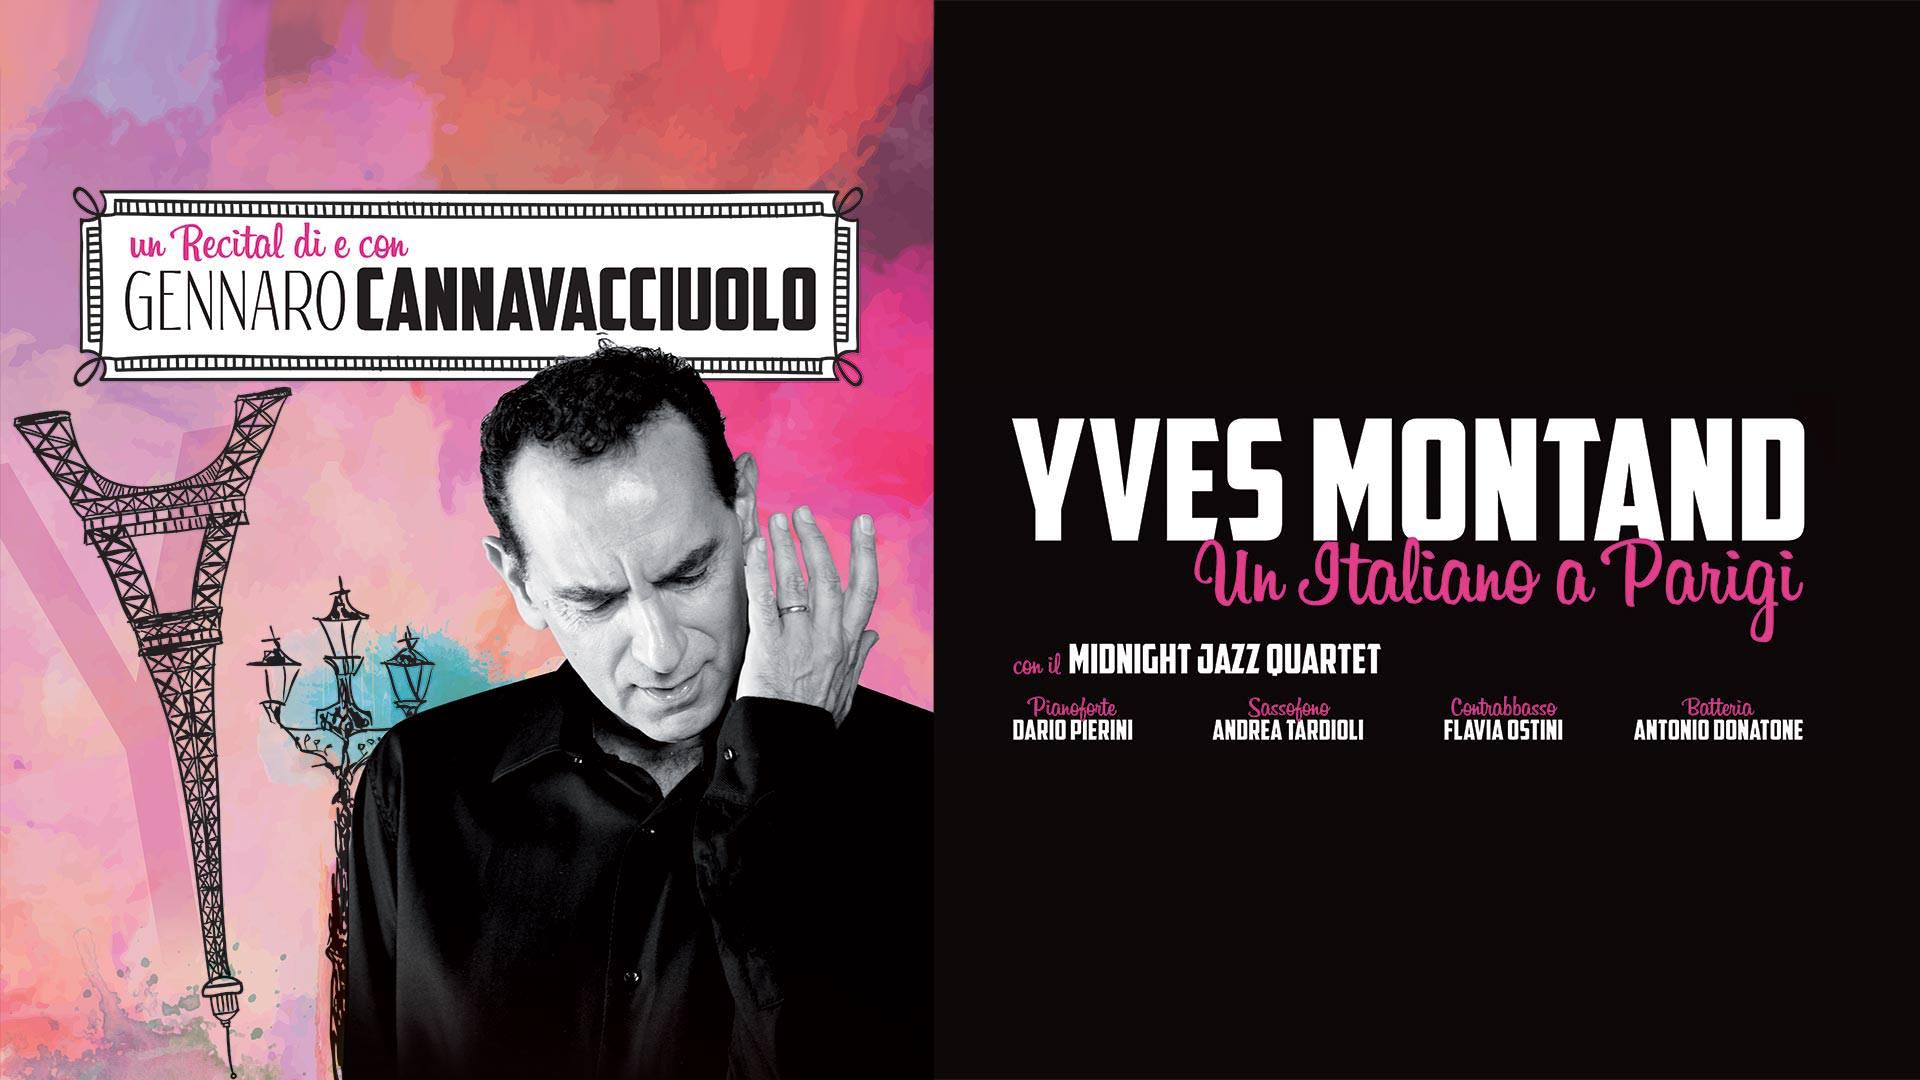 GENNARO CANNAVACCIUOLO - YVES MONTAND - UN ITALIANO A PARIGI